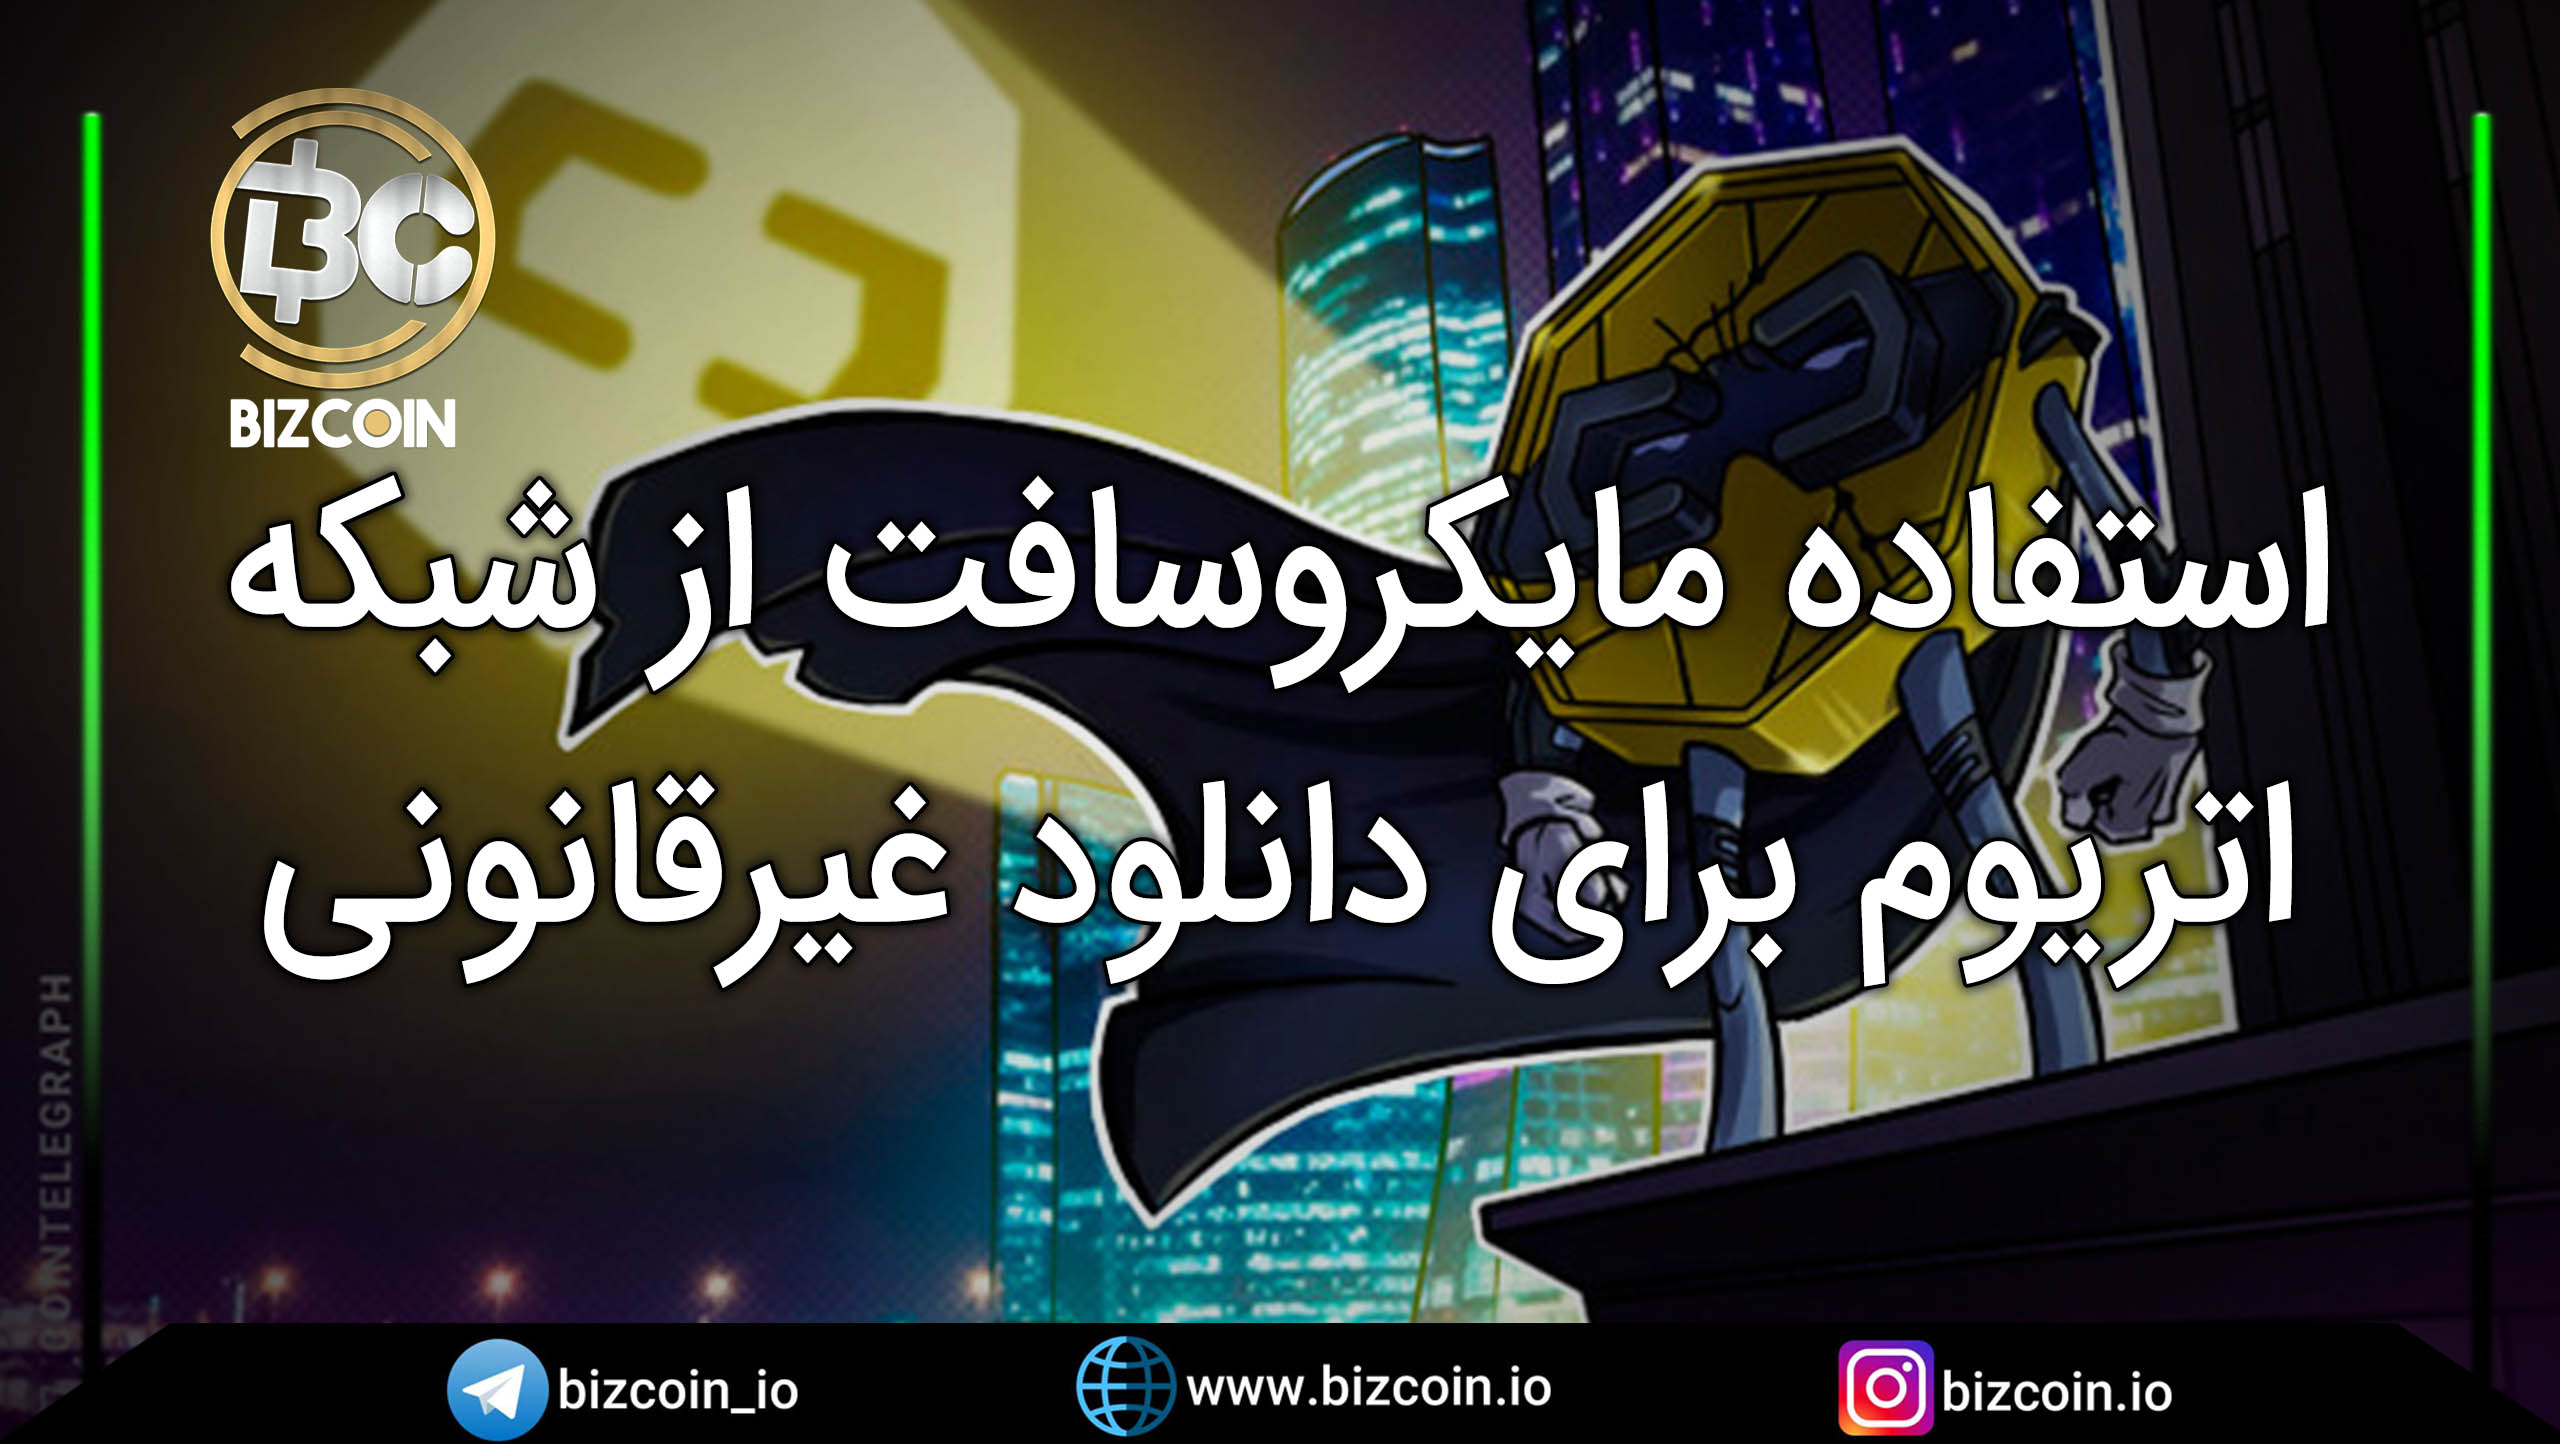 Microsoft uses ethereum Blockchain to download illegally استفاده مایکروسافت از بلاکچین اتریوم برای دانلود غیرقانونی